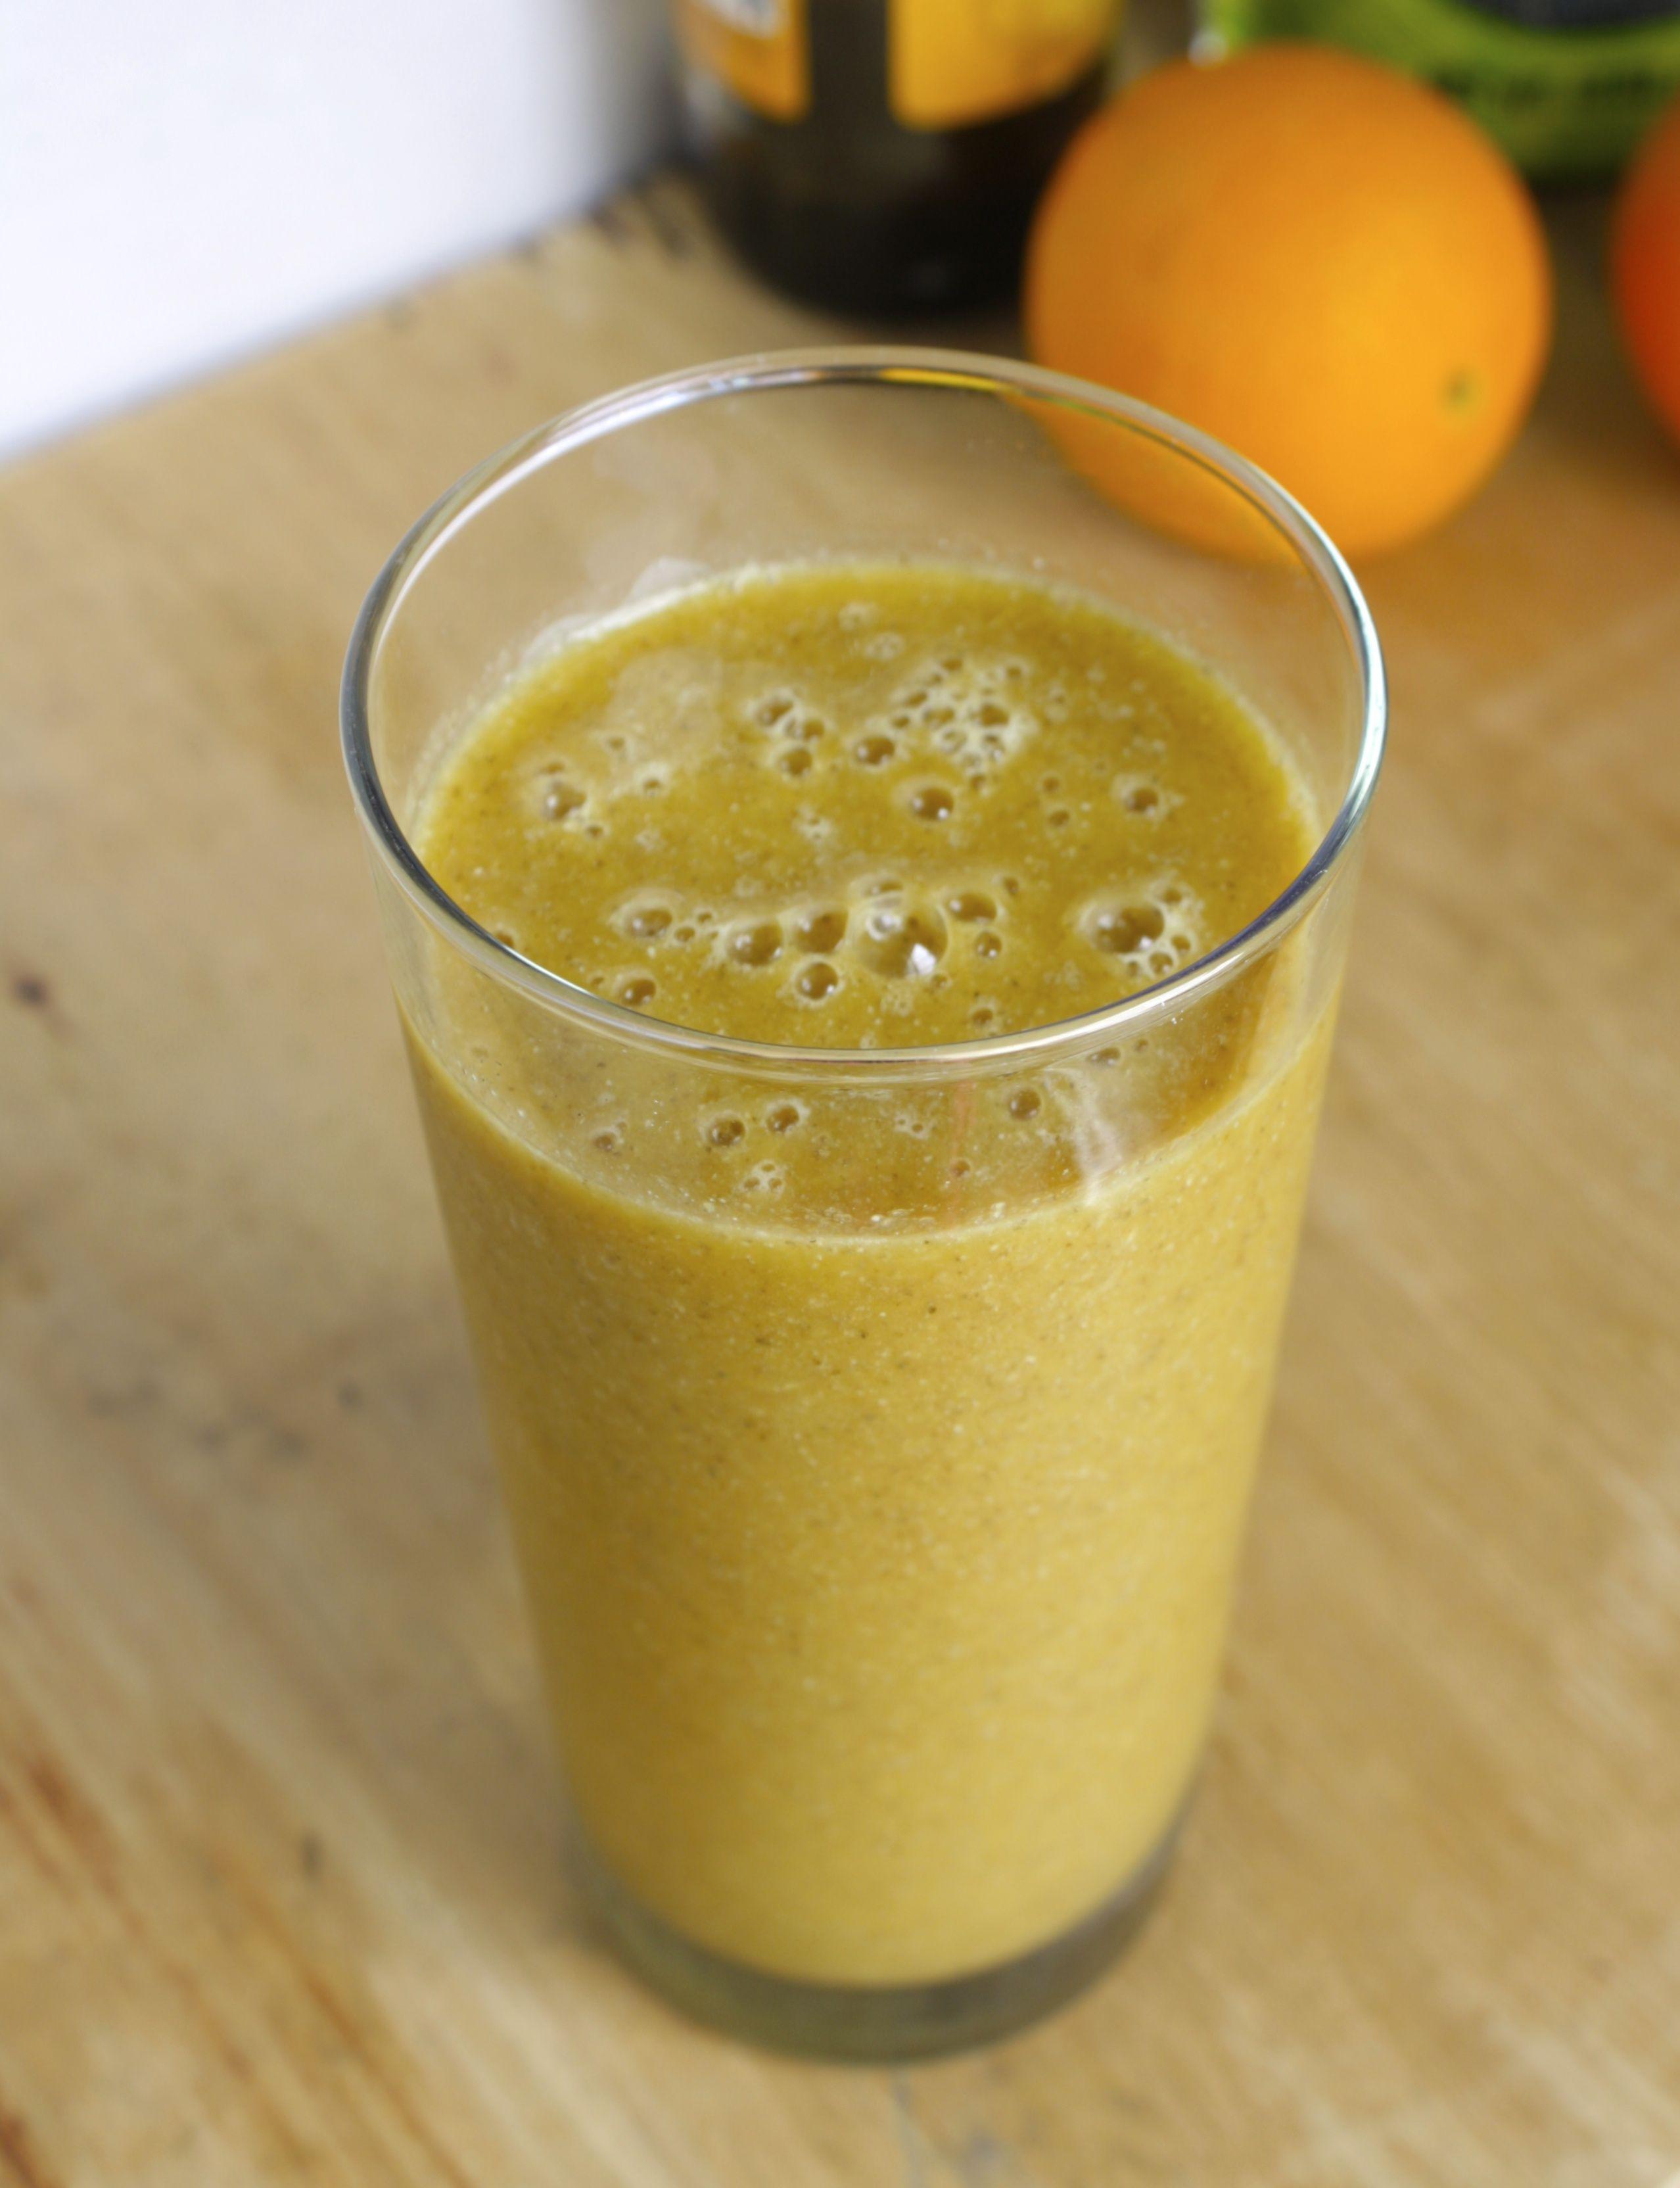 Iron Boosting Orange Juice